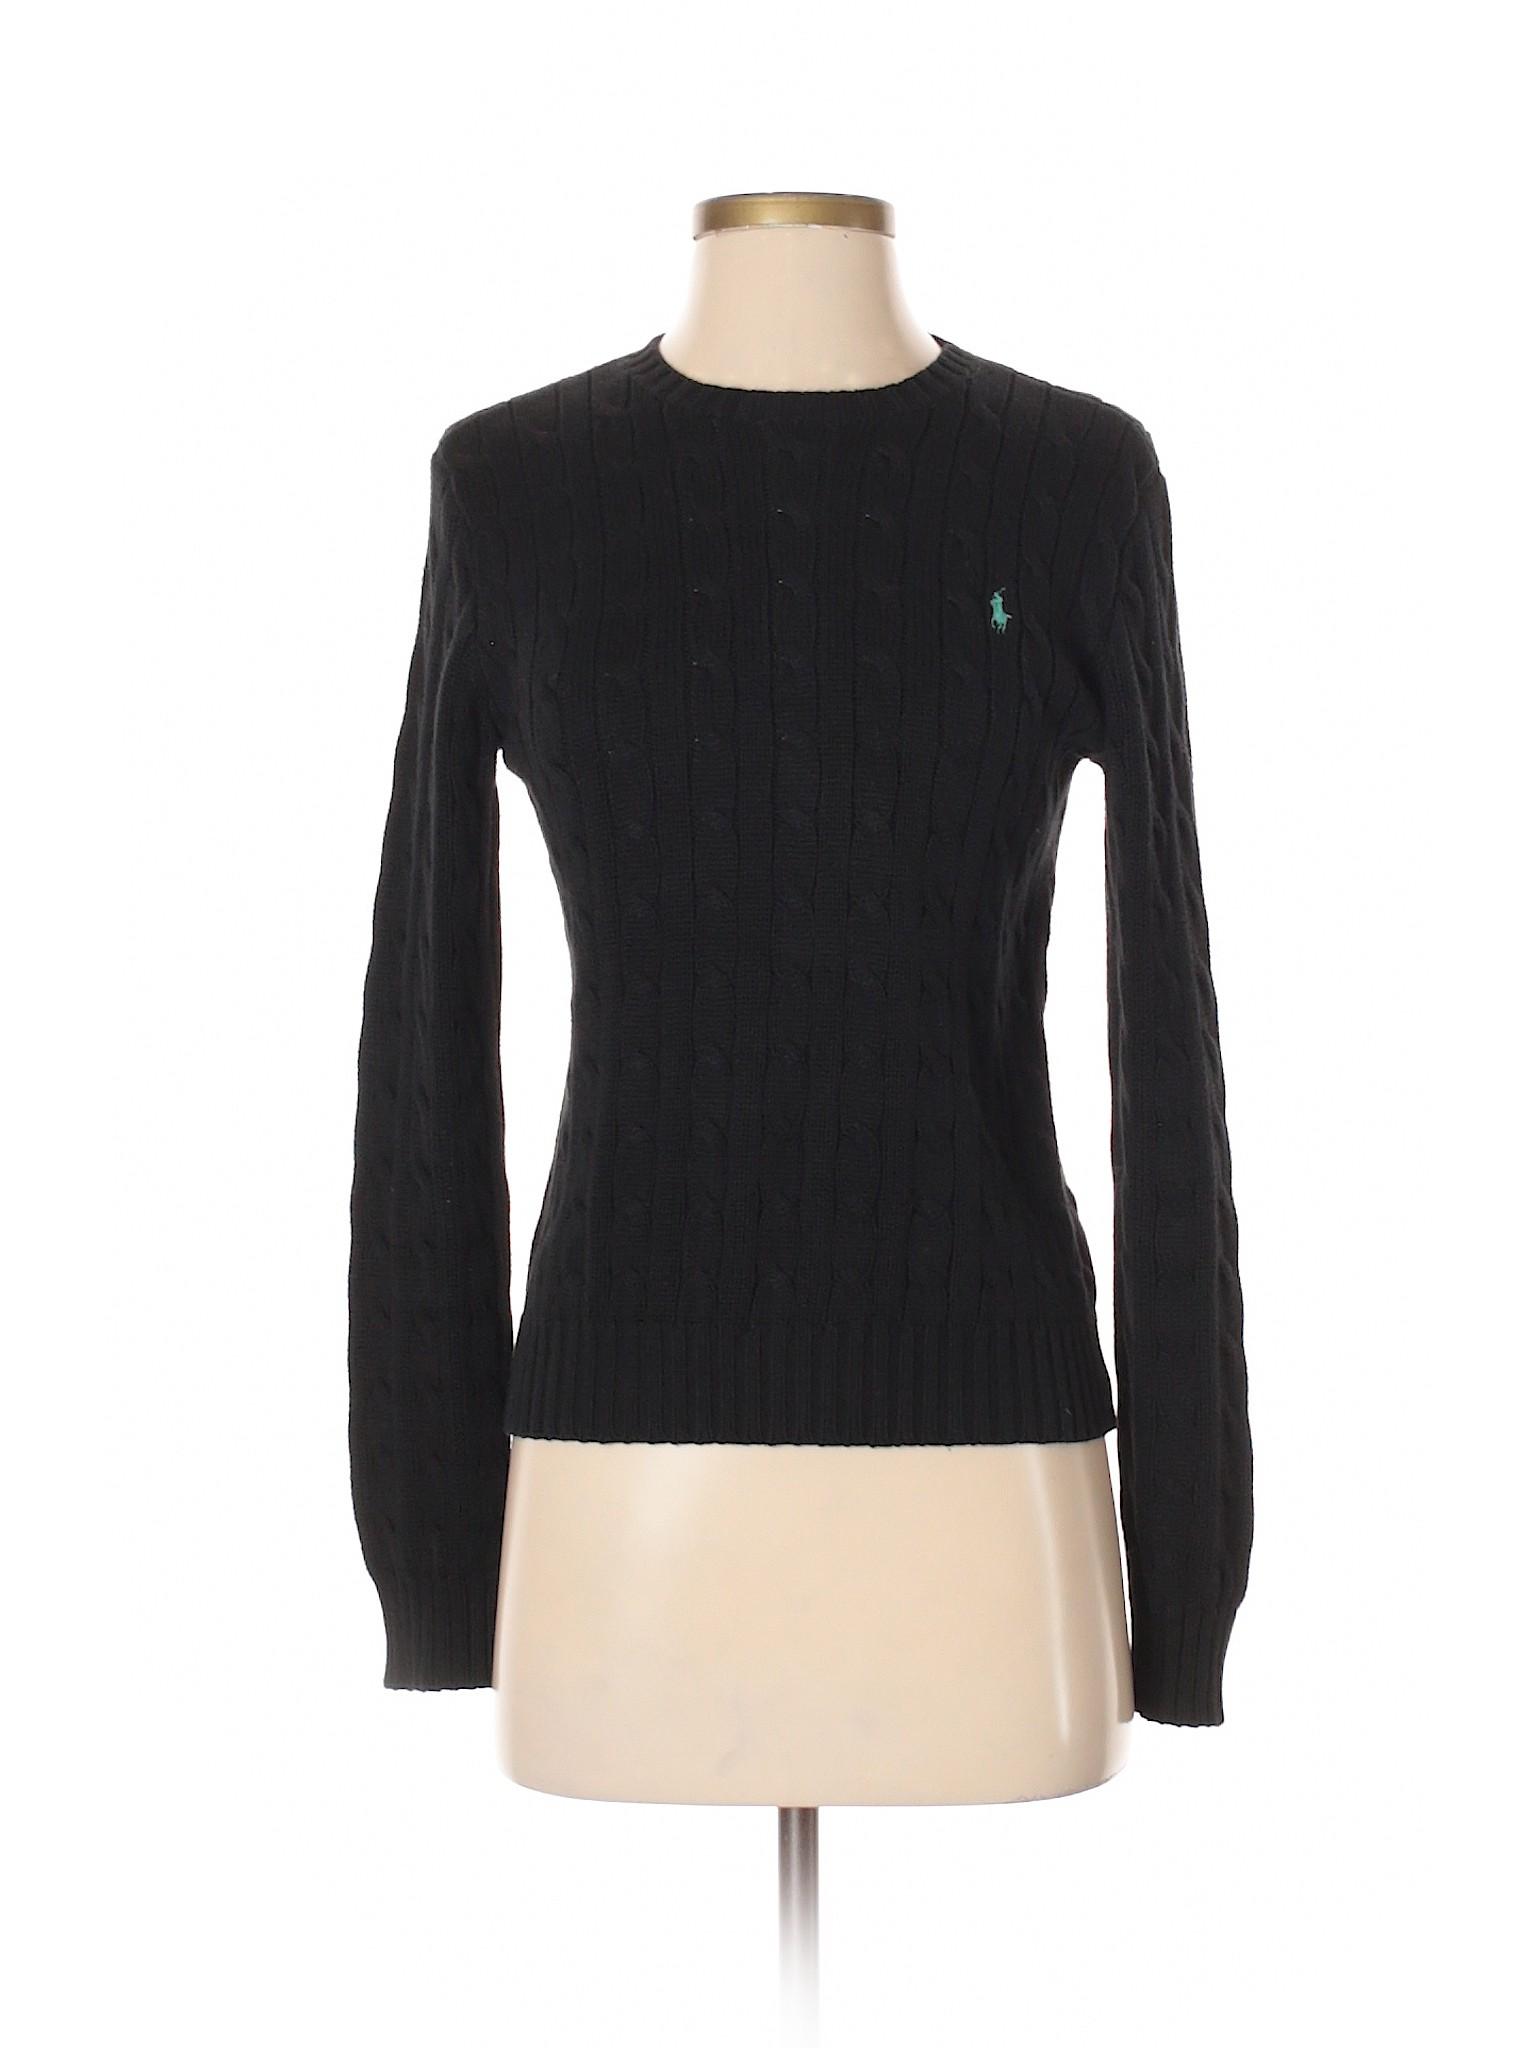 Ralph Boutique Ralph Boutique Lauren Lauren Boutique Ralph Pullover Sweater Pullover Sweater Lauren BSTqRw5